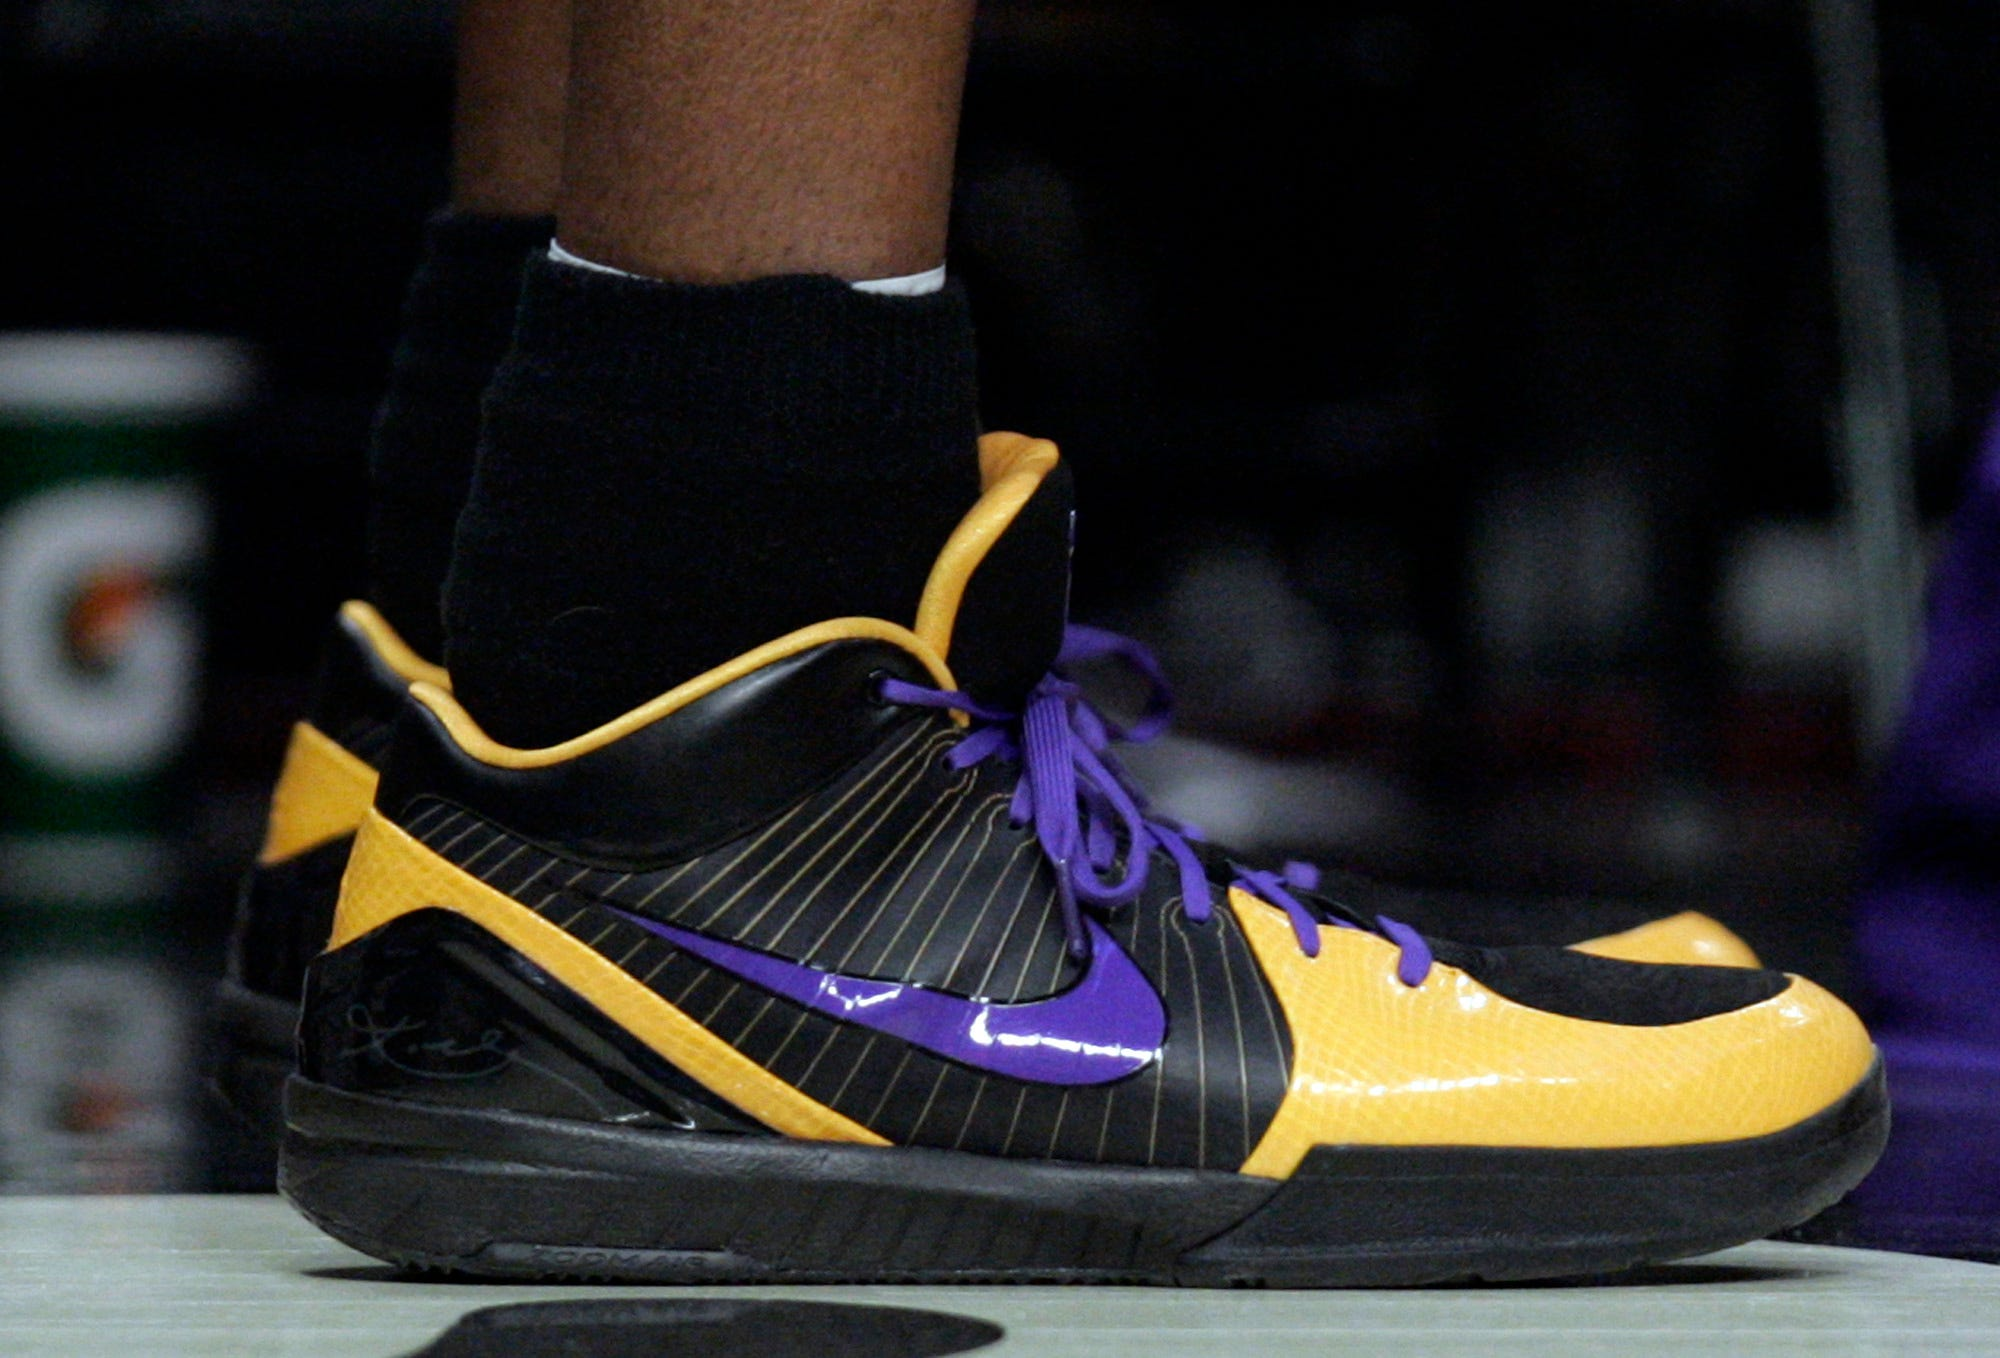 diluido blanco lechoso Atlético  Nike sells out of Kobe Bryant merchandise online; shoe plan pending